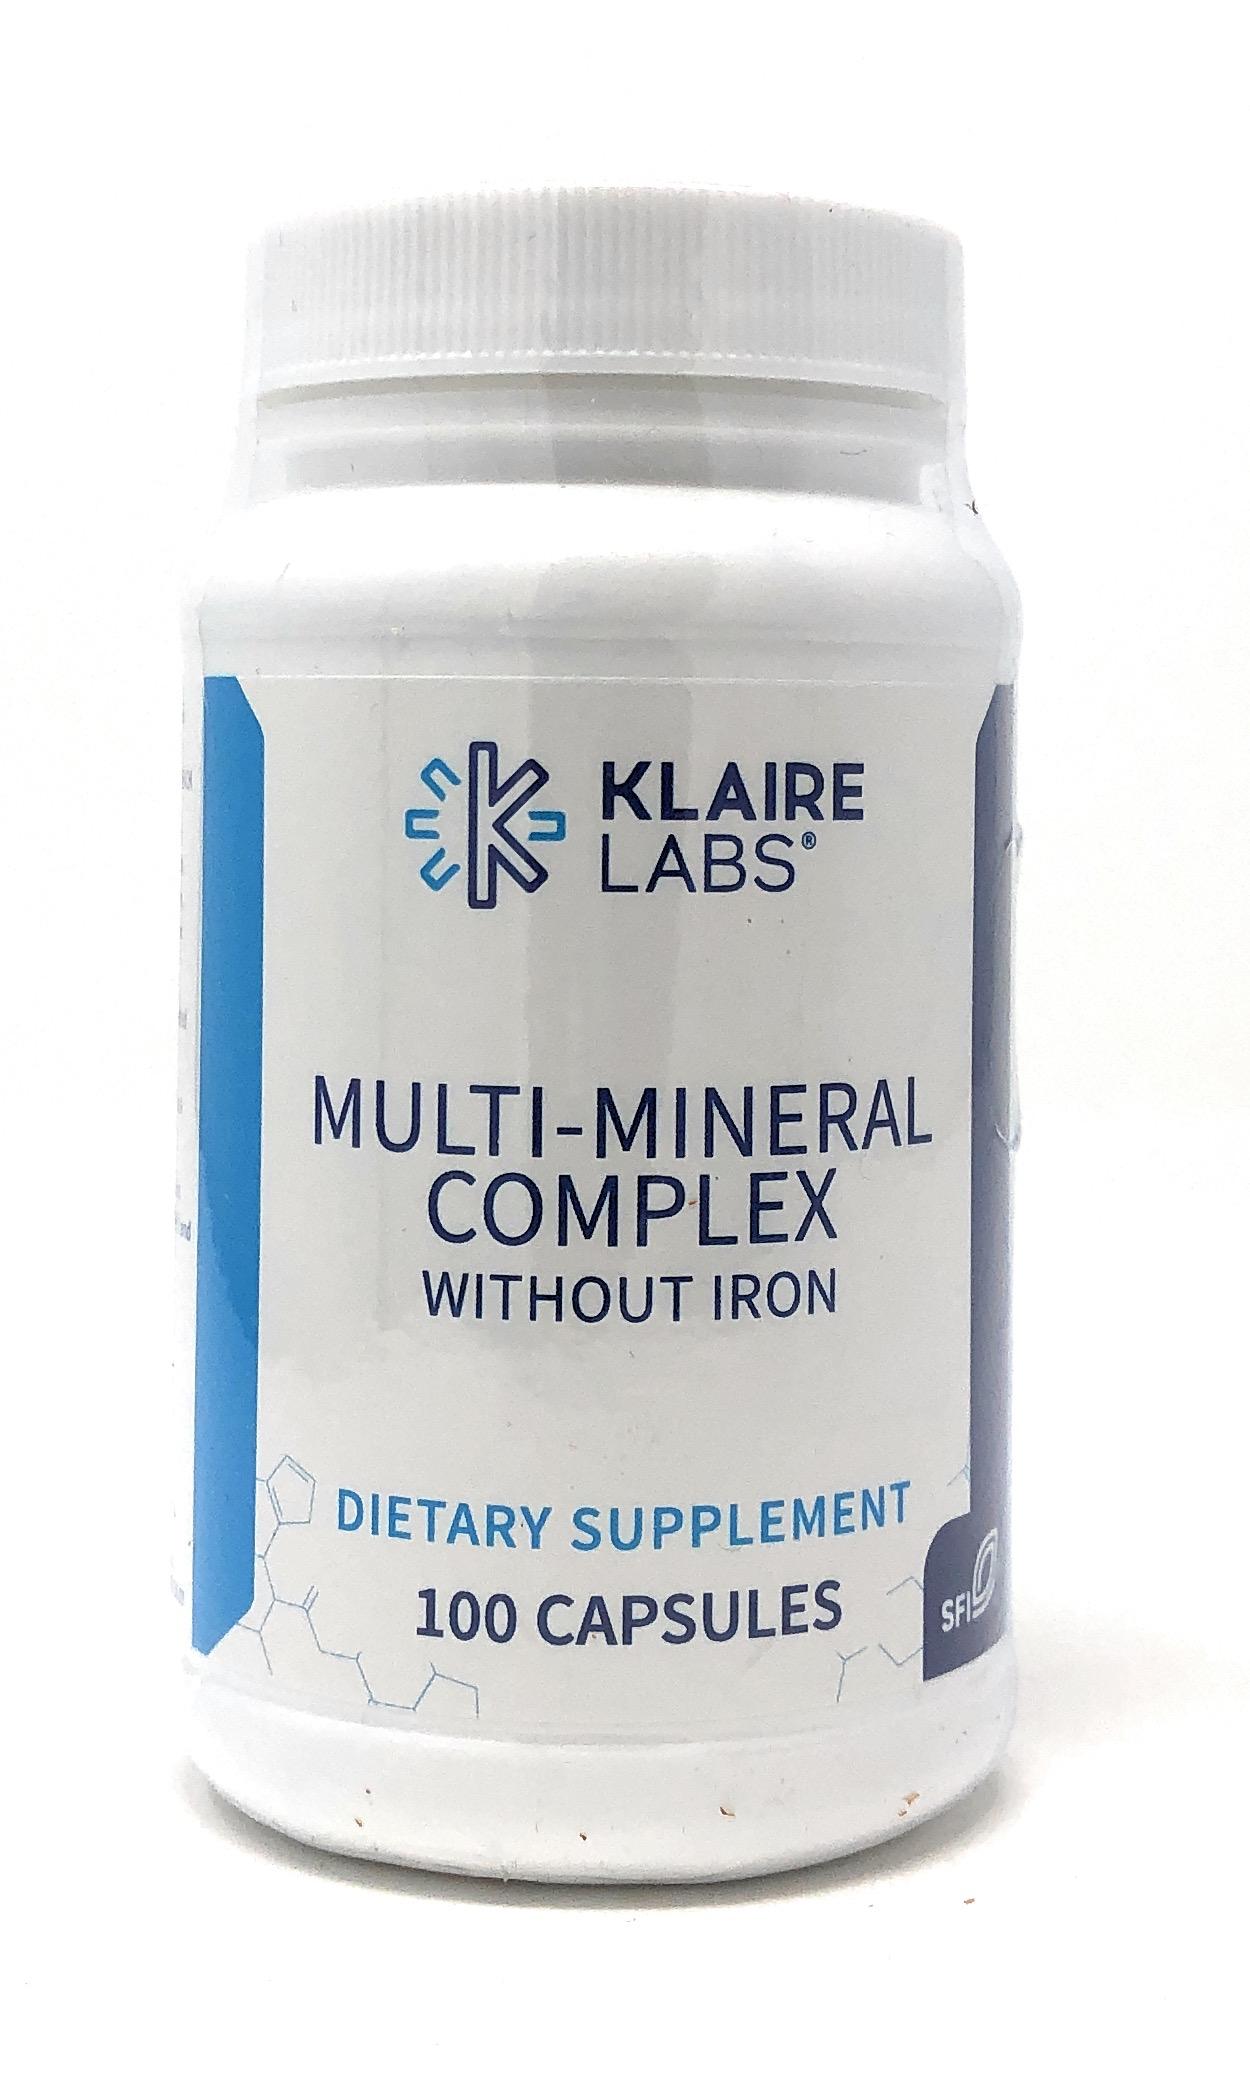 Klaire Labs Multi-Mineral Complex w/o Iron (ohne Eisen/Jod) 100 veg. Kapseln (61g)